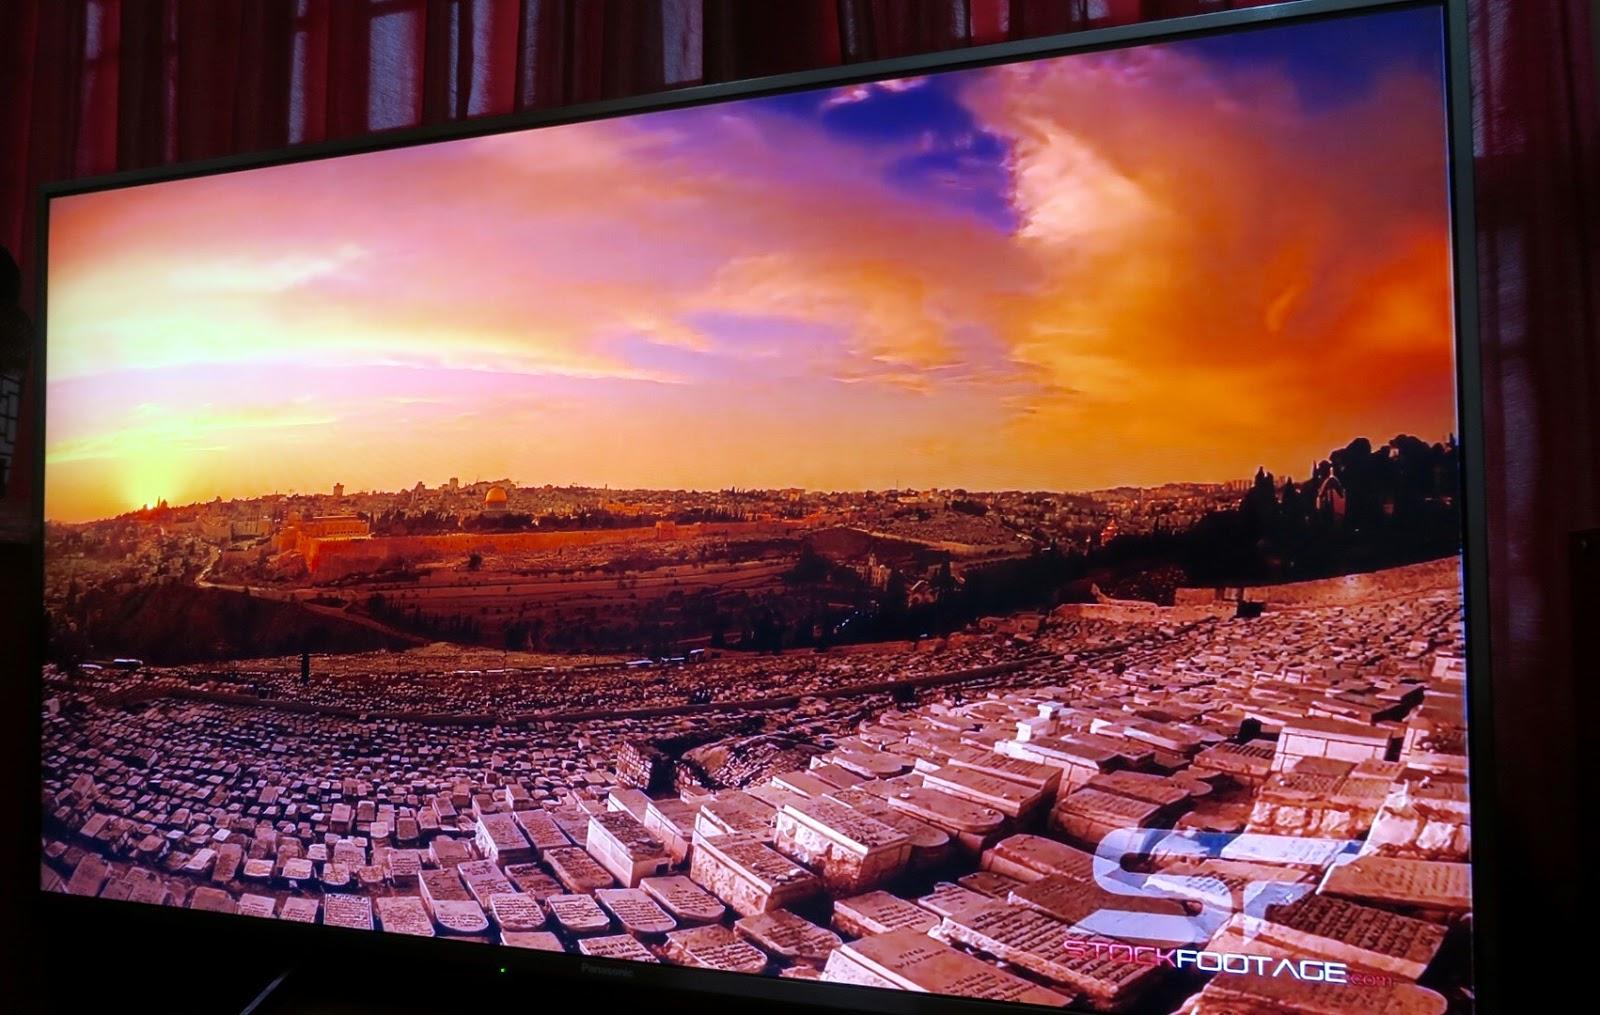 Blog Indonesia Page 3104 Of 3106 Tcash Vaganza 28 Produk Ukm Bumn Mr Kerbaw Keripik Bawang Original Bisa Jadi Pengganti Monitor Laptop Loh Resolusinya Tinggi Banget